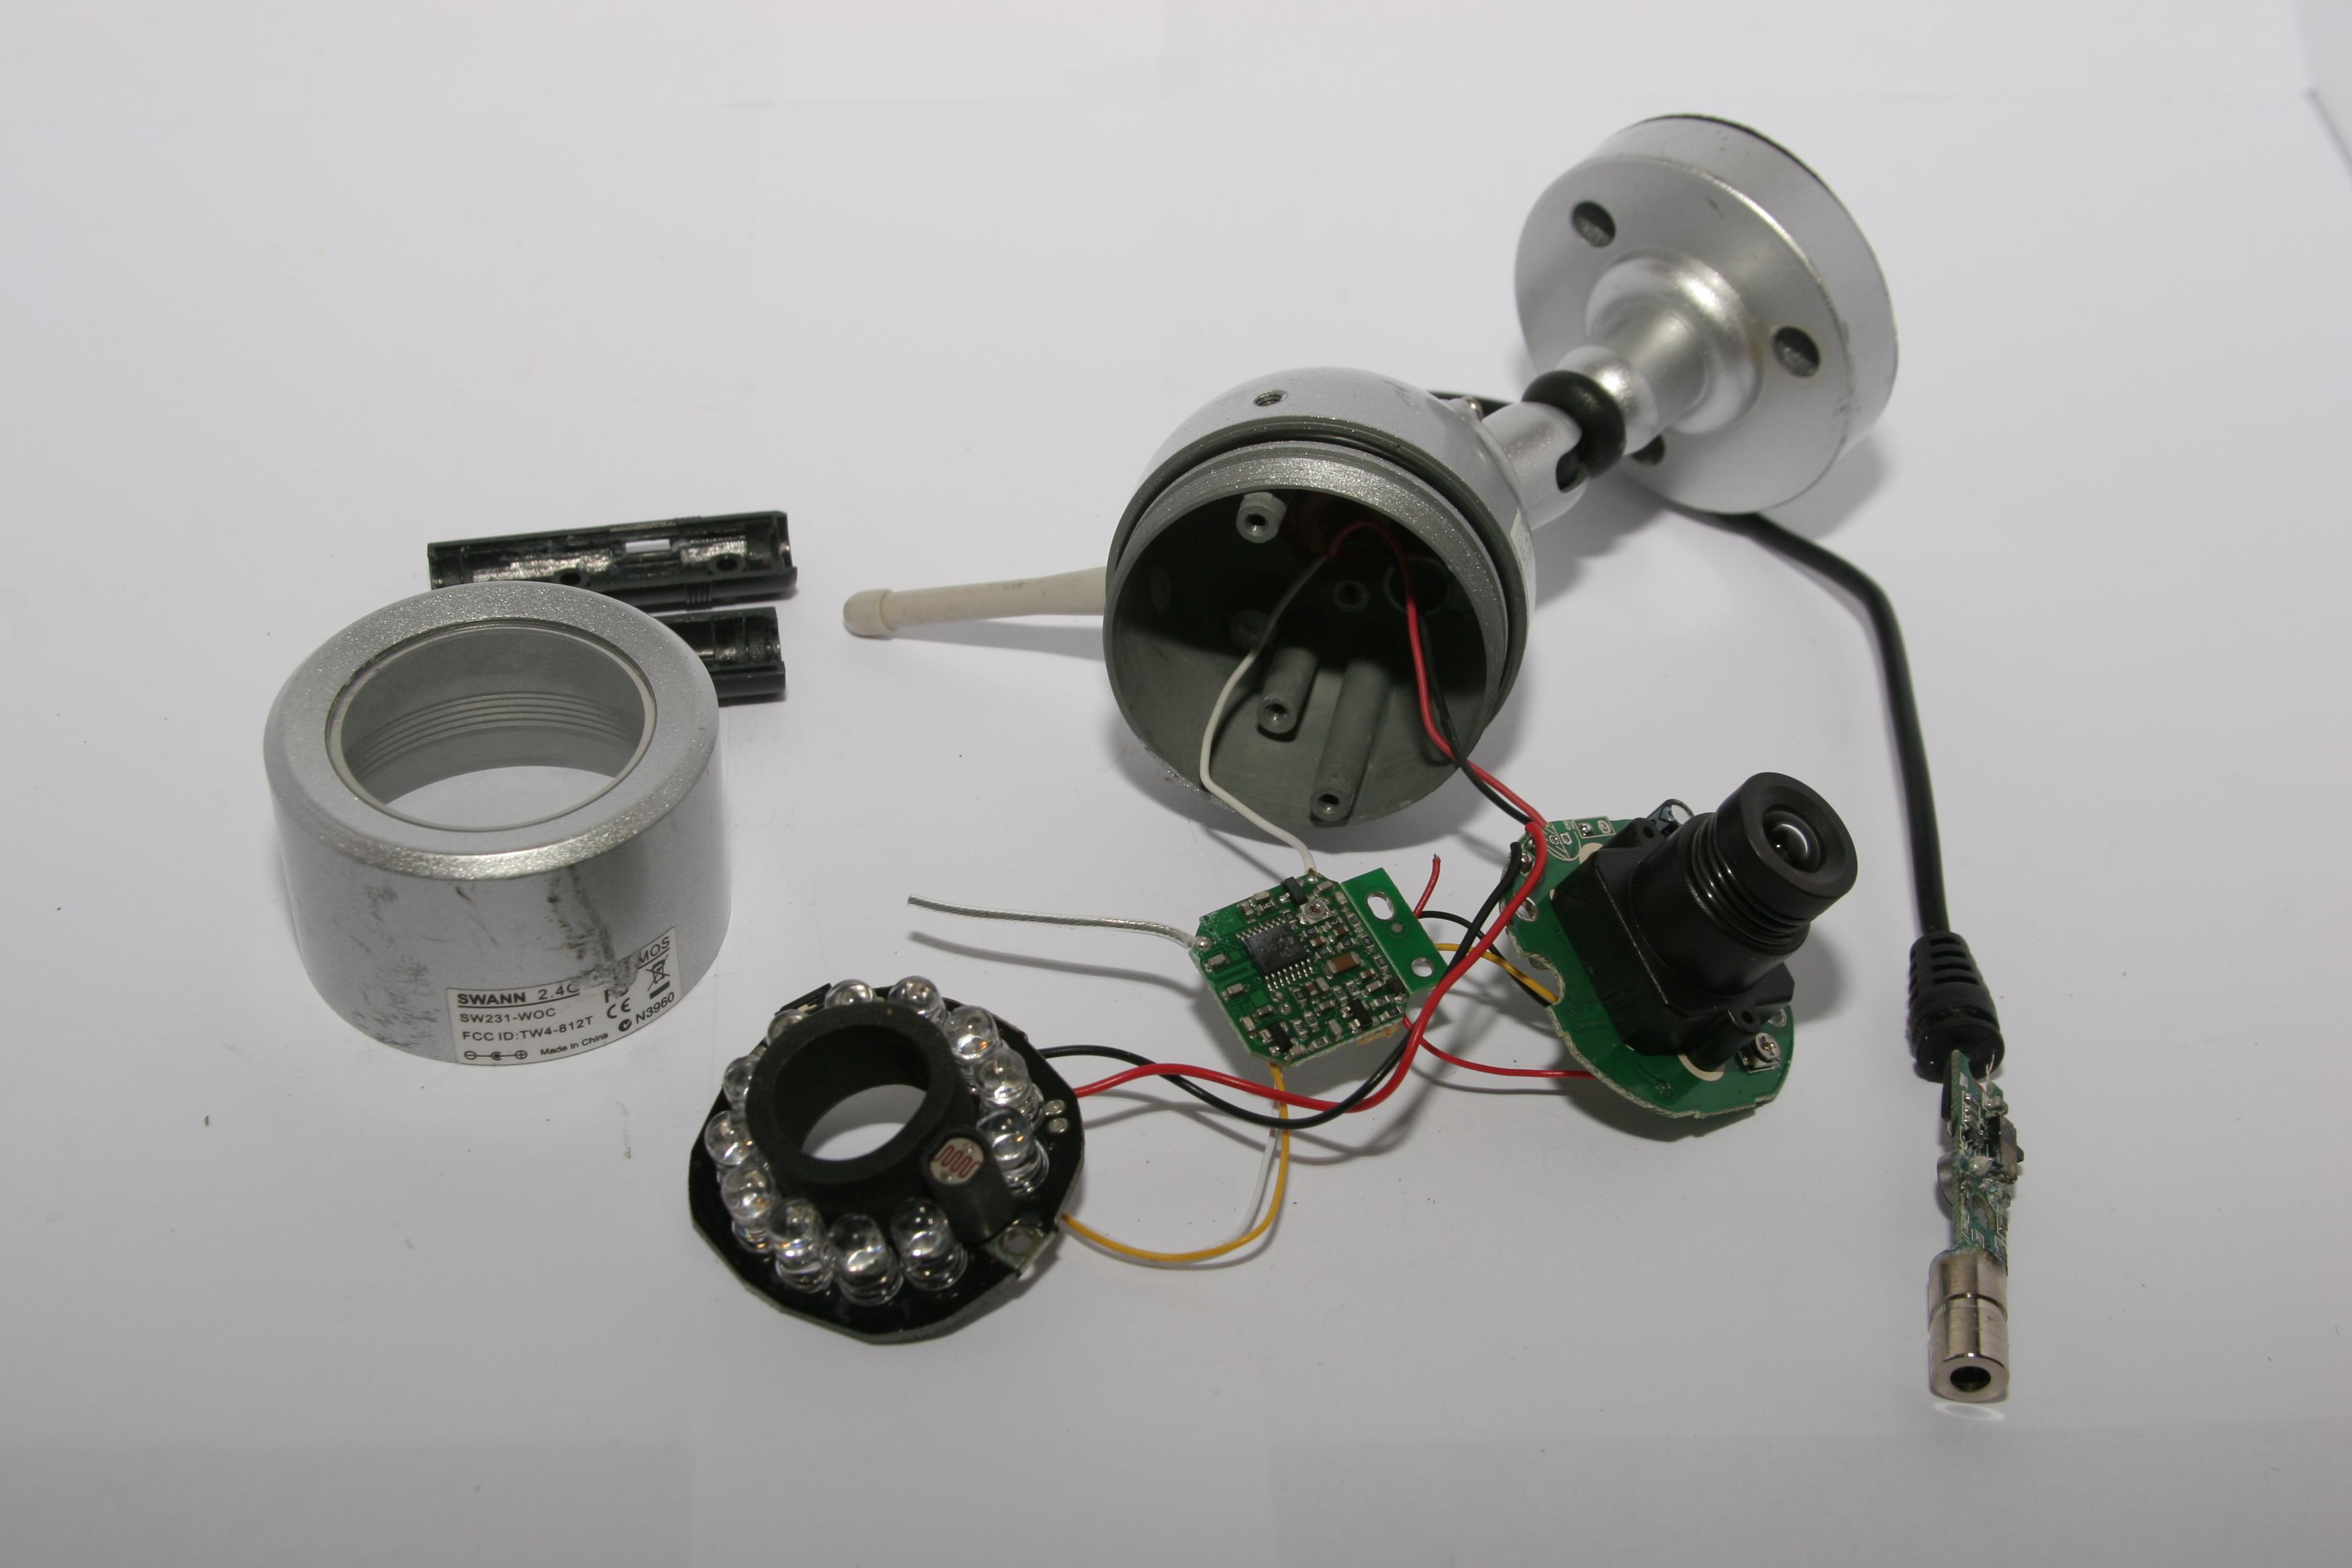 Swann Camera Wiring Diagram | Manual E-Books - Swann N3960 Wiring Diagram